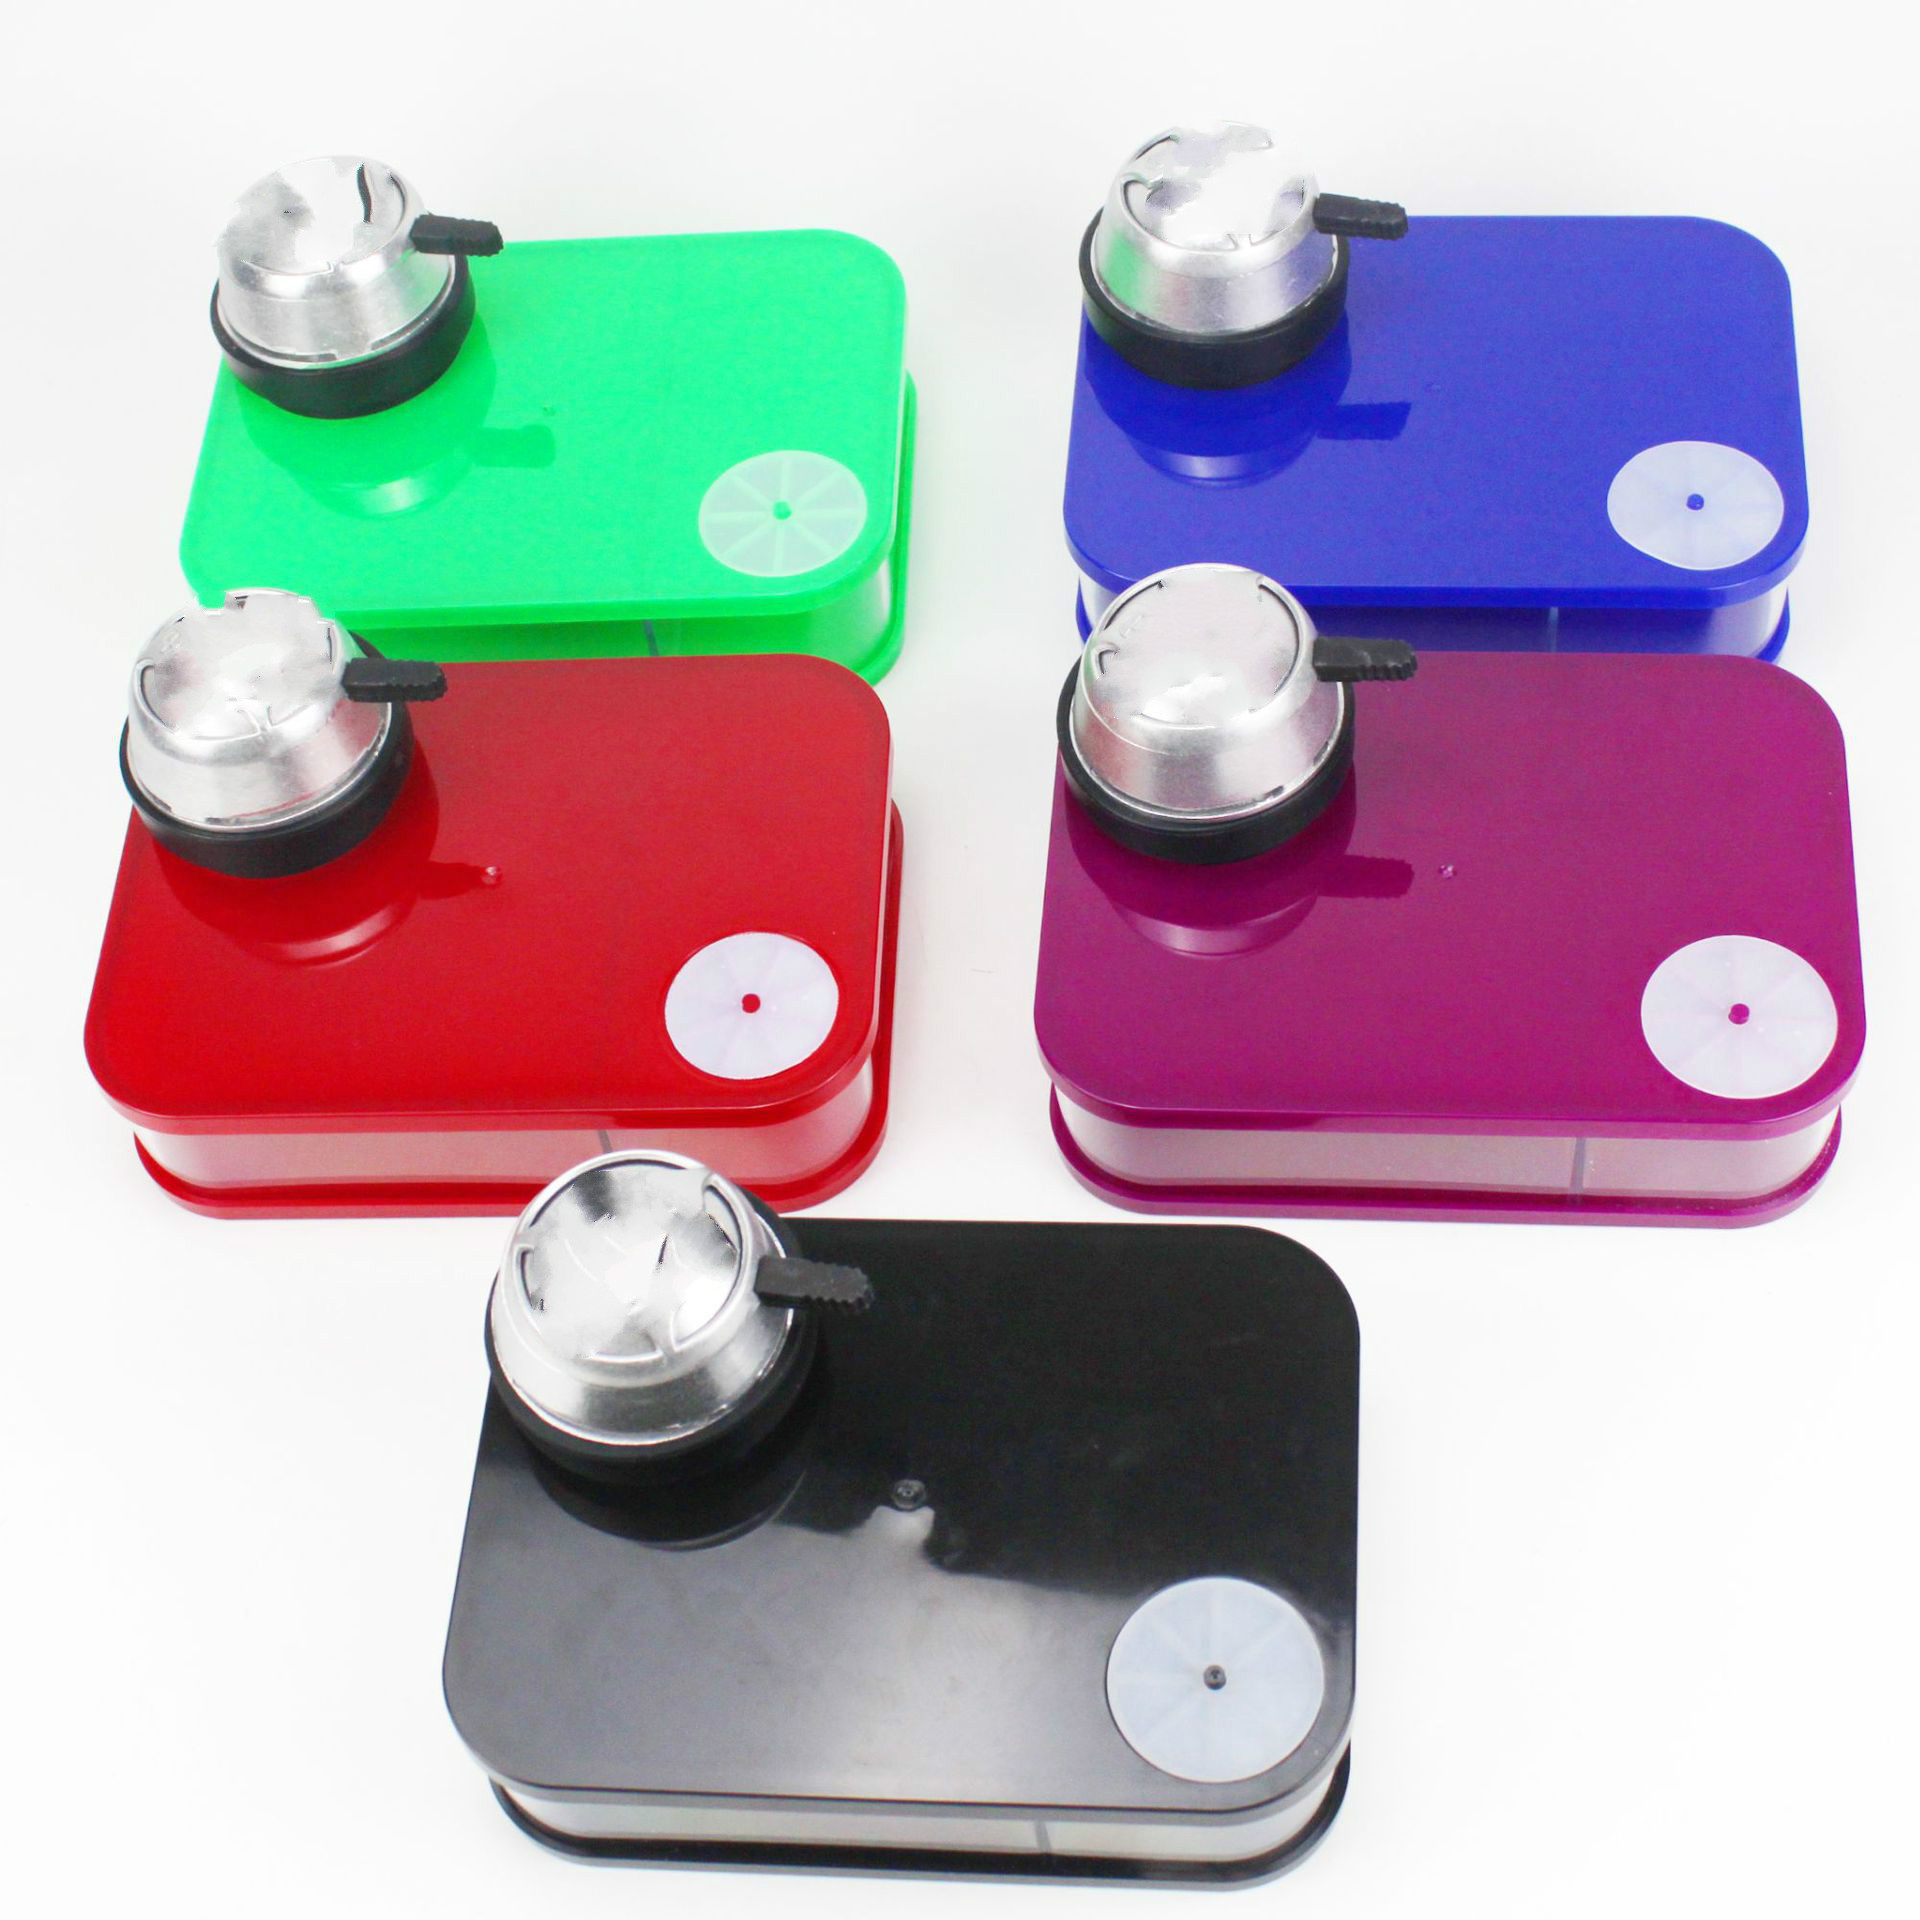 Black Box Acrylic Hookah Colorful LED Light Narghile Shisha With Remote Control Book Shaped Shisha Bong 3